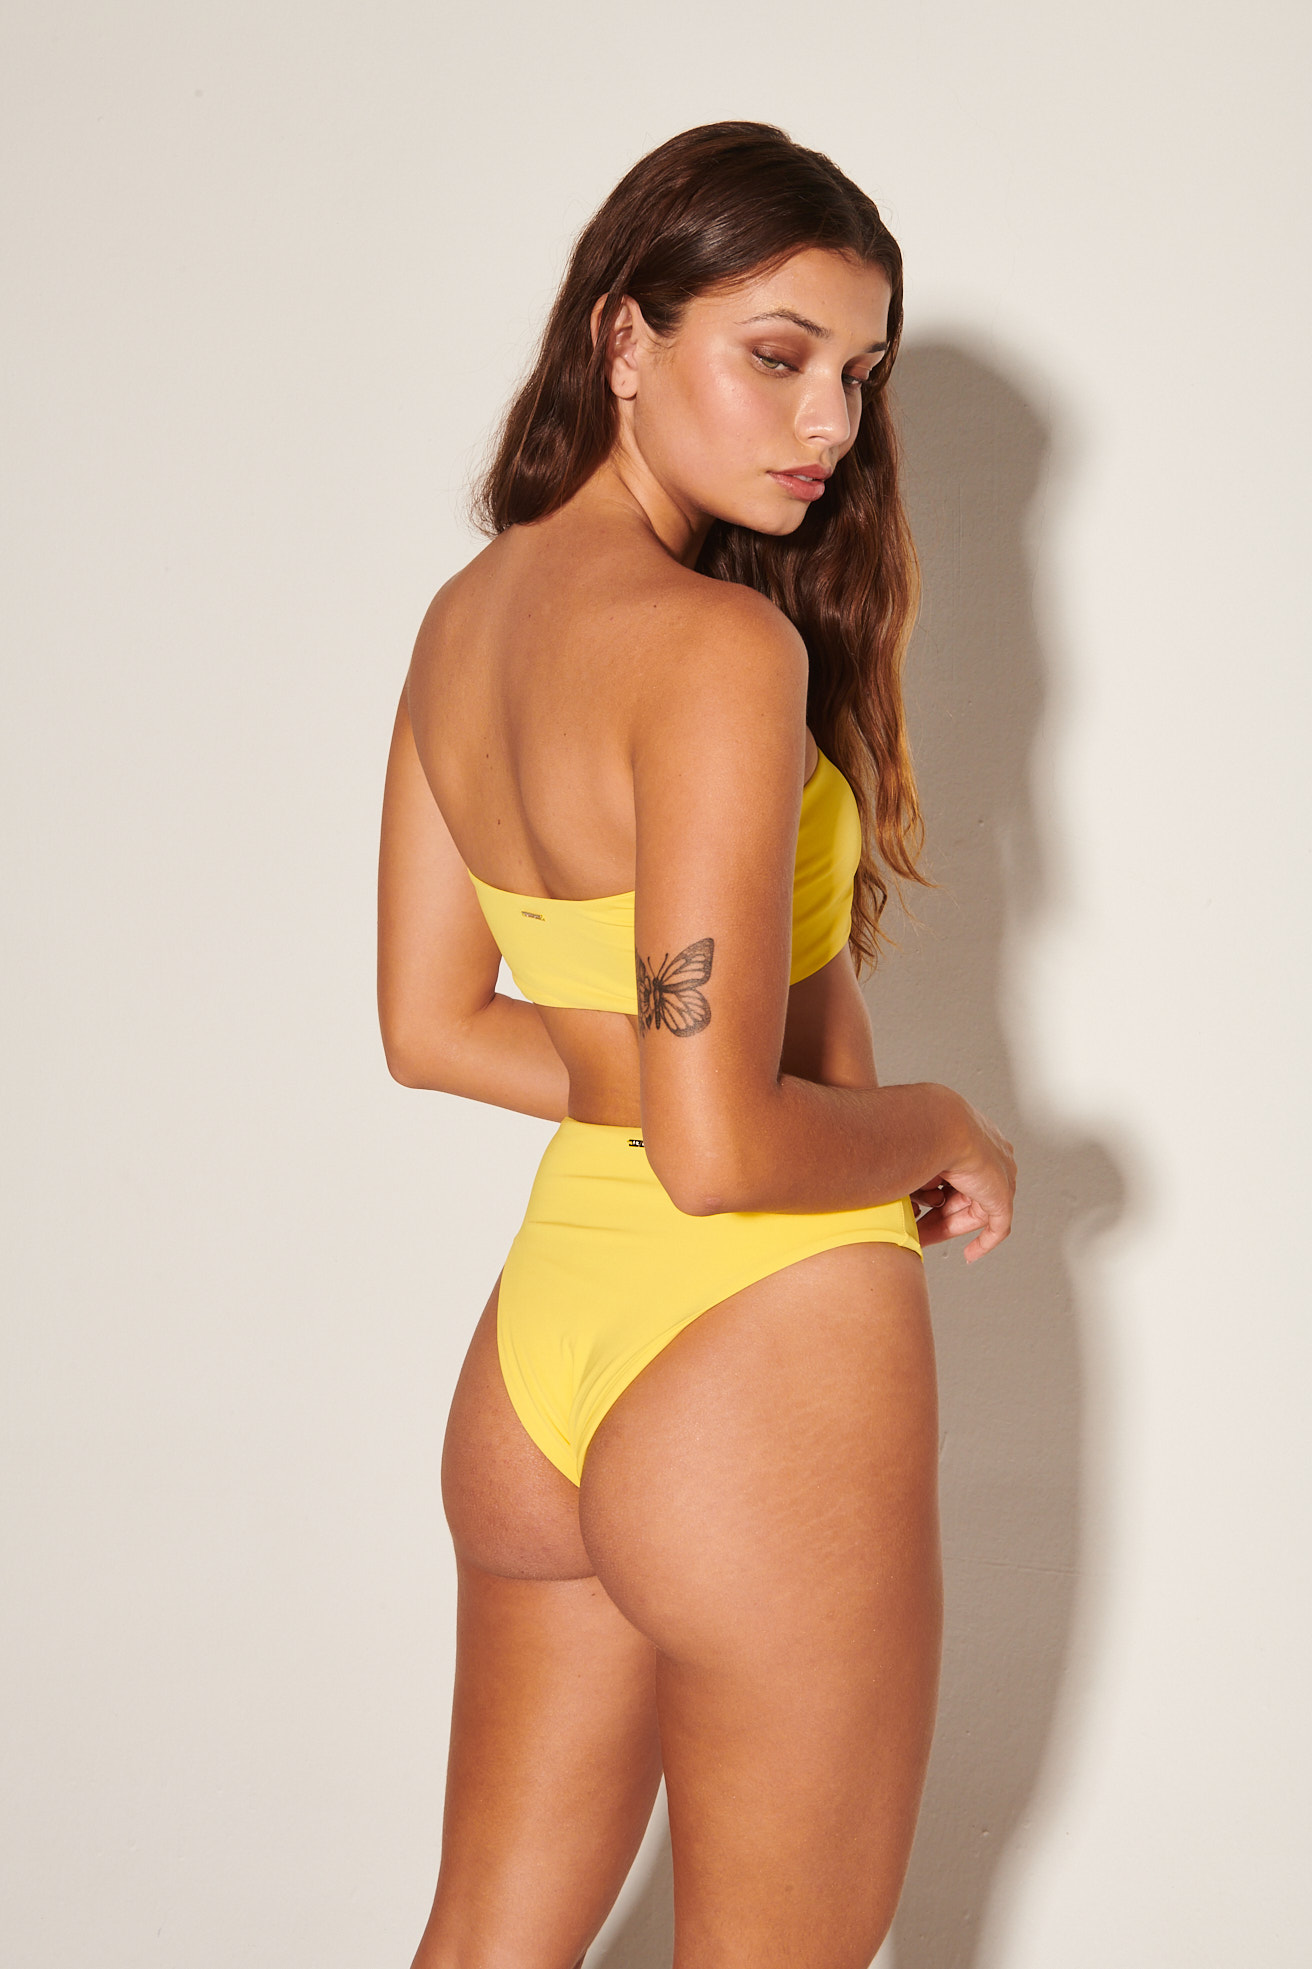 Top Tqc Reto com Calça Hot Pants Amarelo